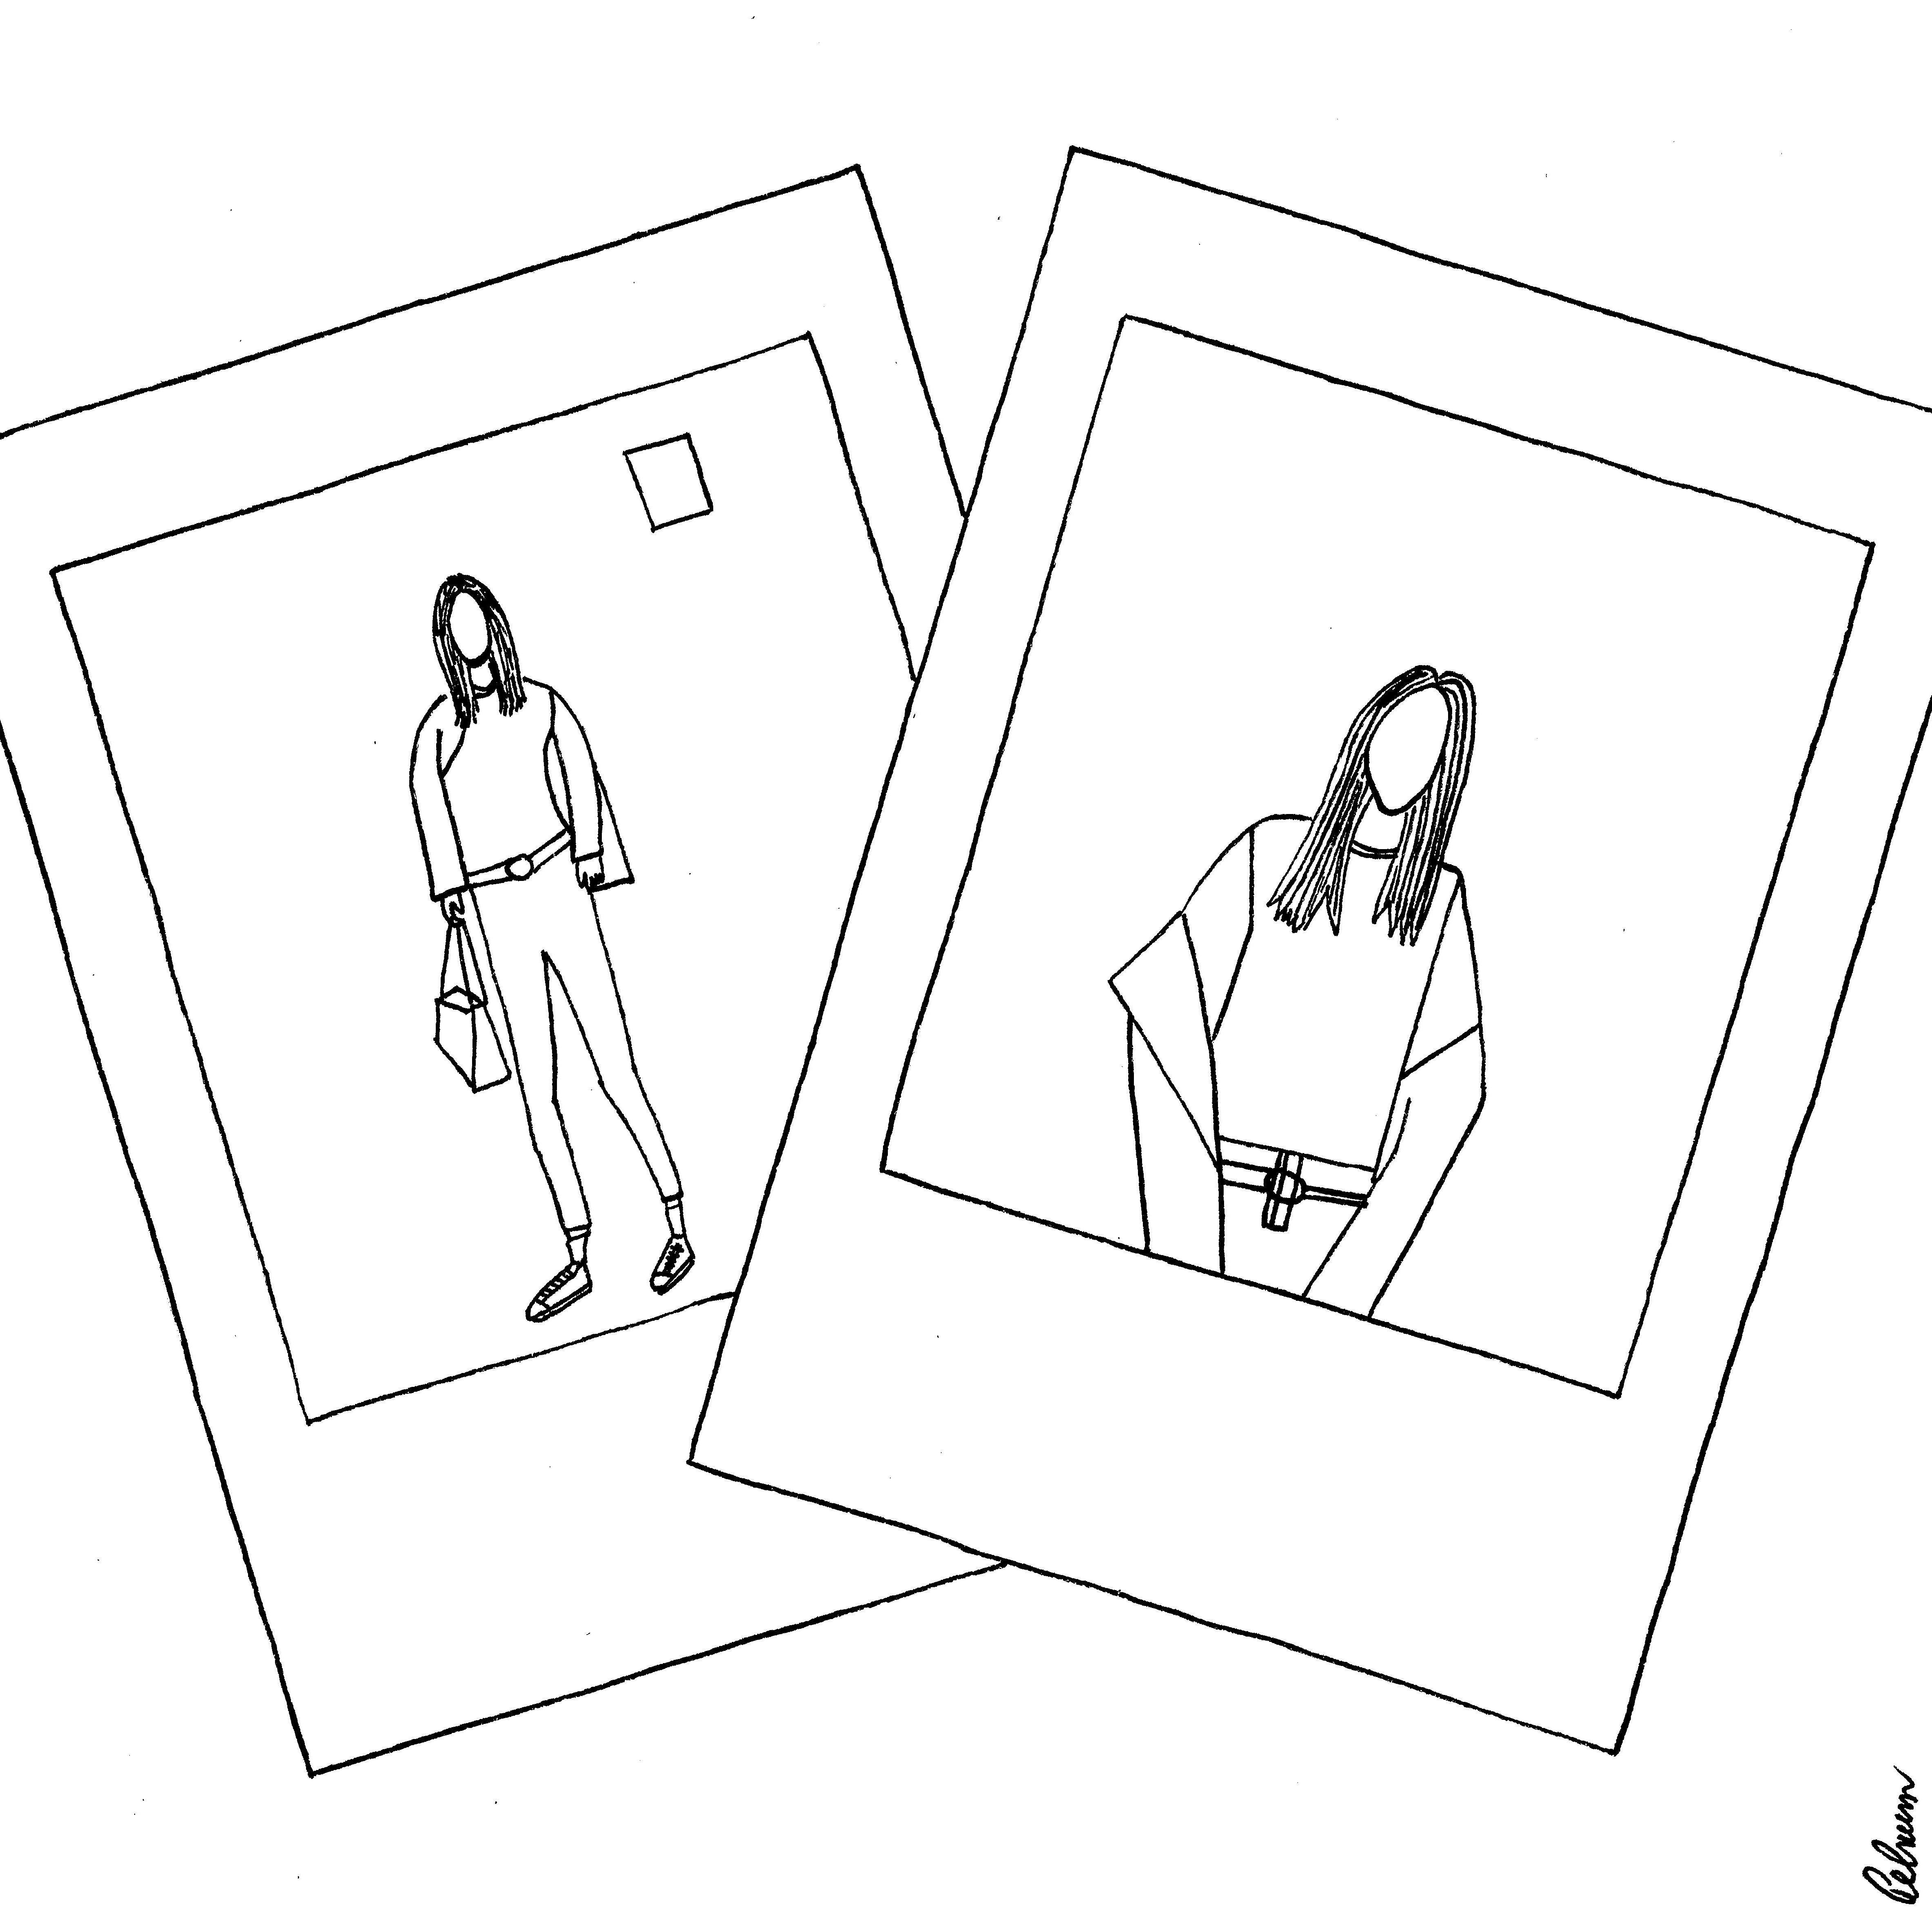 4735x4735 Polaroid Pen Drawing 21x21cm Art Polaroid And Drawings